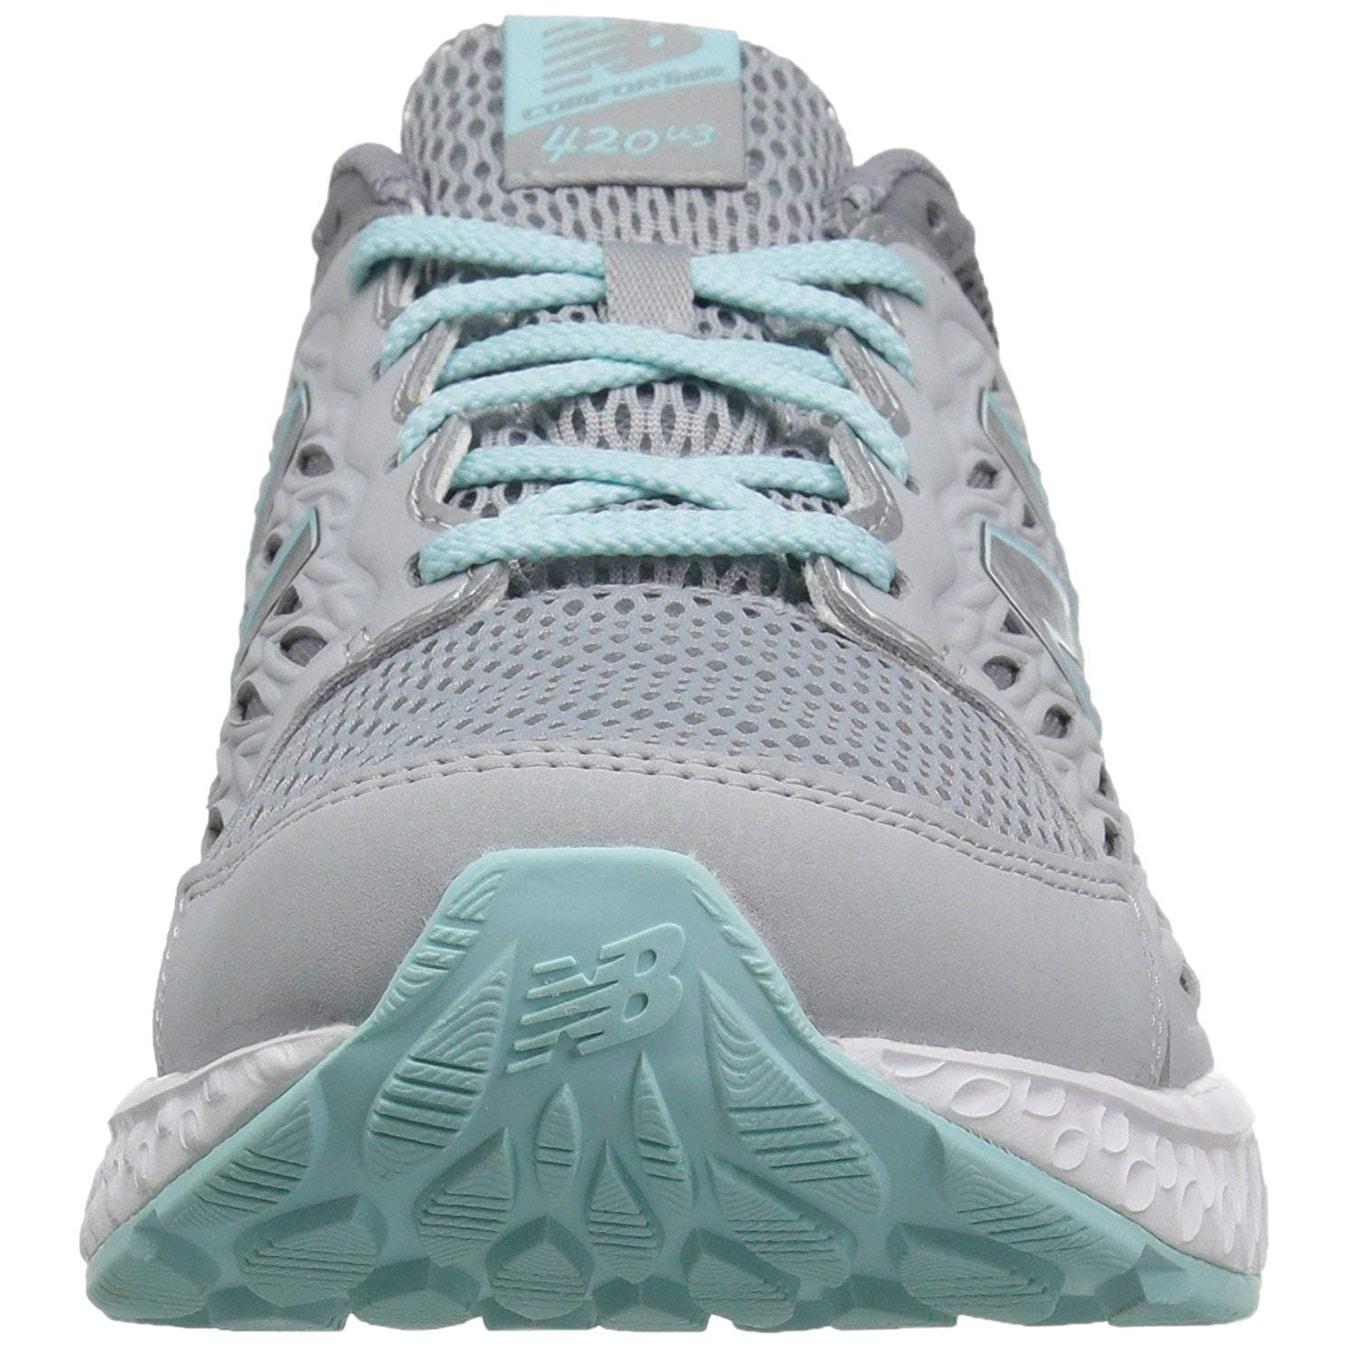 New Balance Women's W420v3 Running Shoe, Silver MinkGunmetalOzone Blue Glow 7.5 M Us